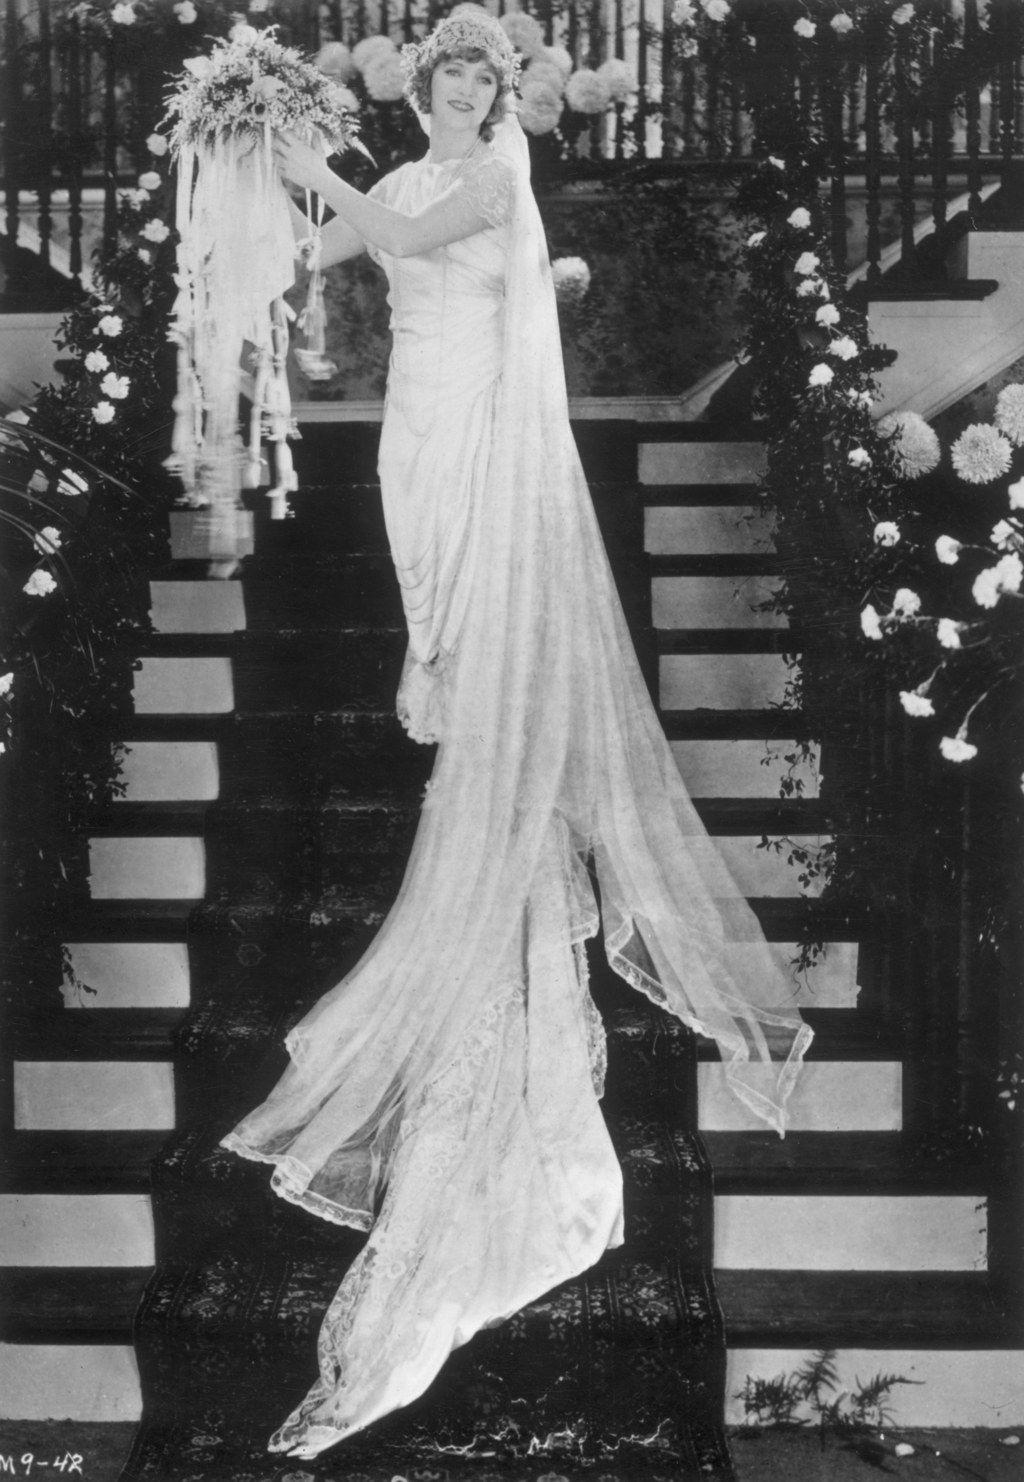 stunning vintage wedding dresses from yesteryear weddings